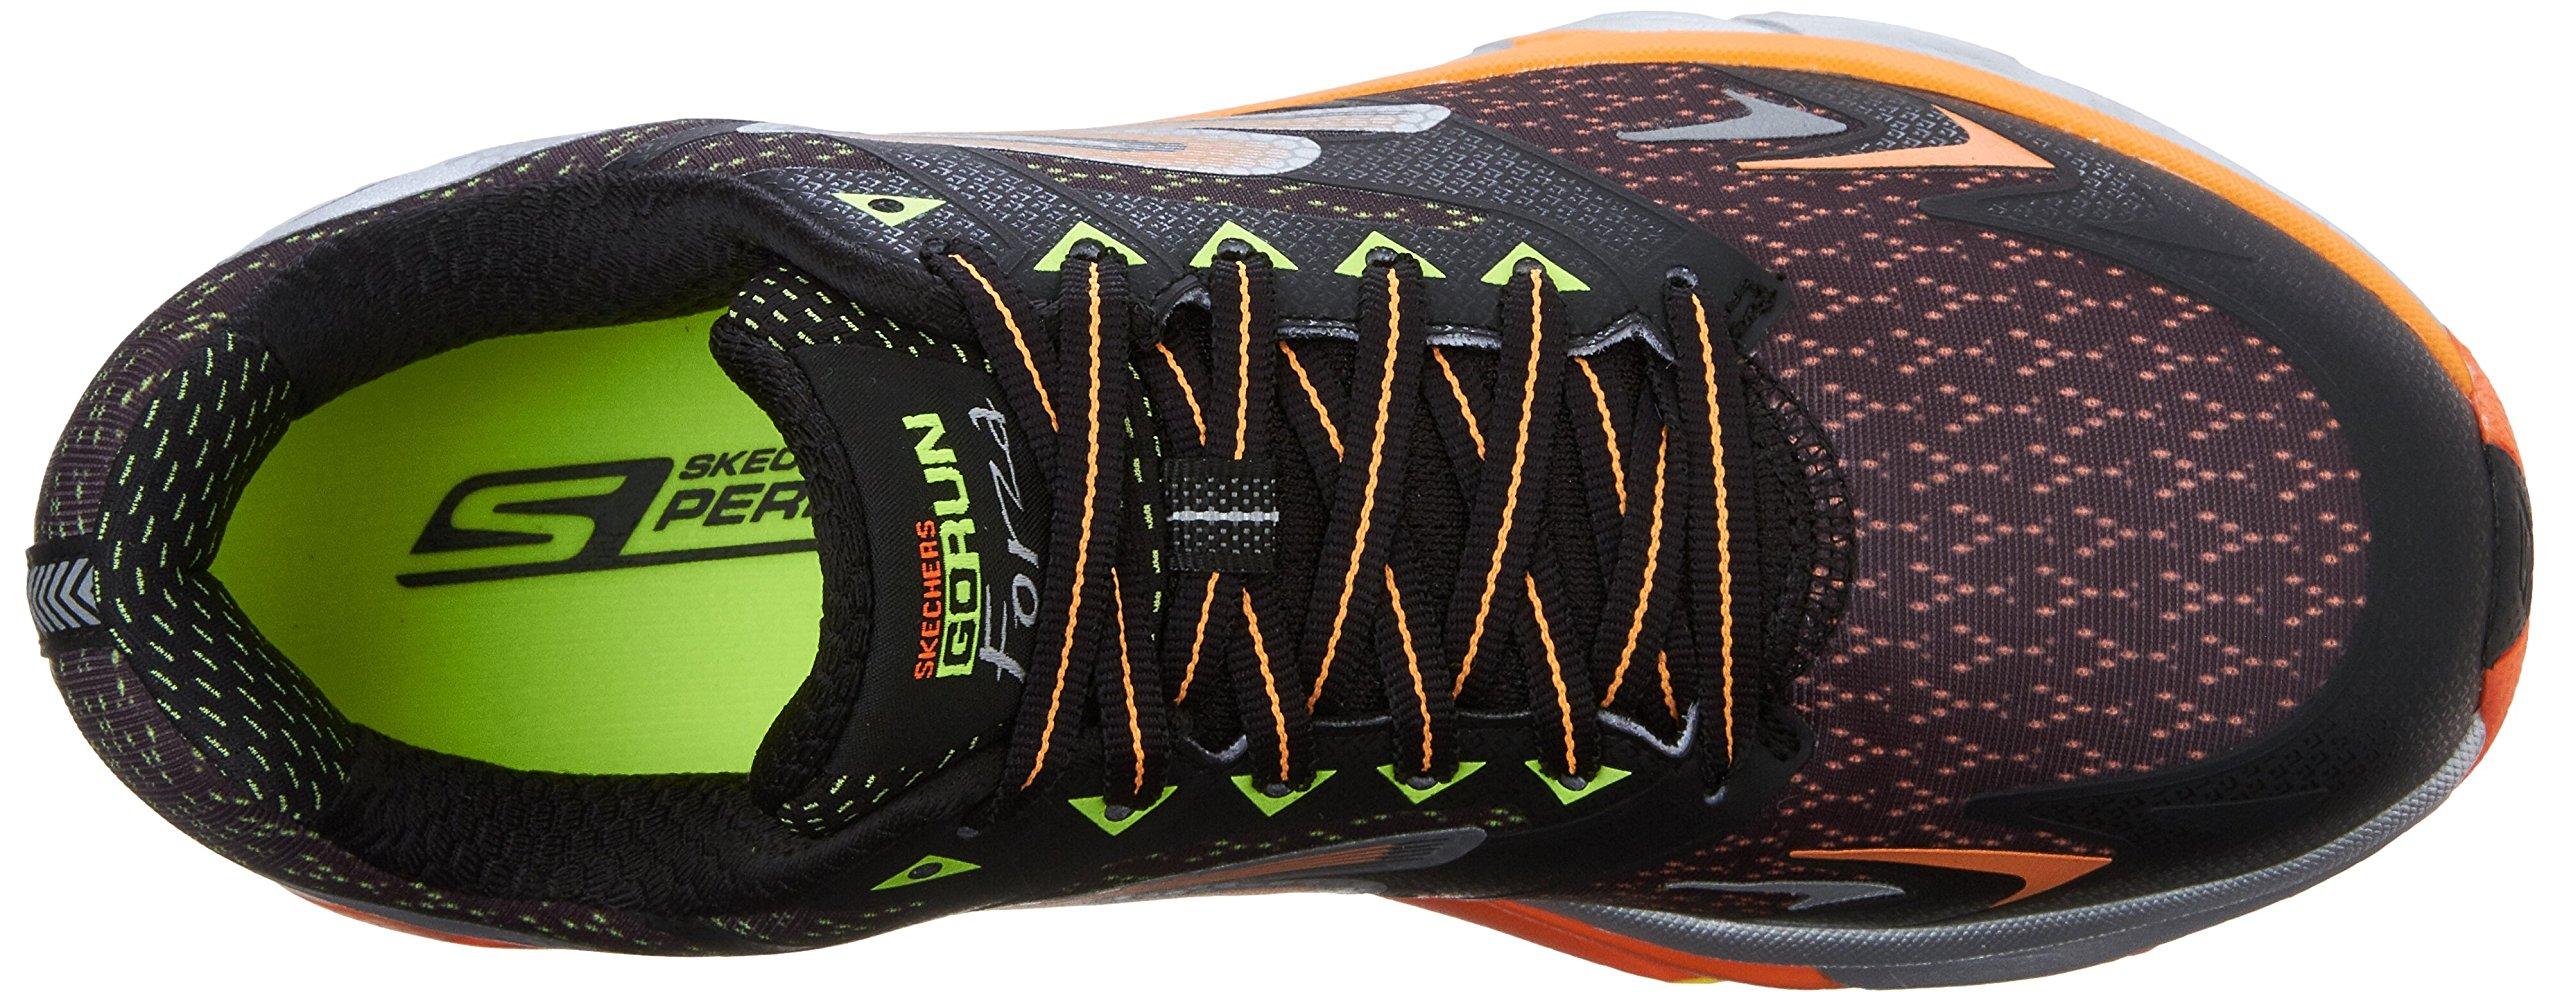 81YccvIKvVL - Skechers Men's Go Forza Running Shoes